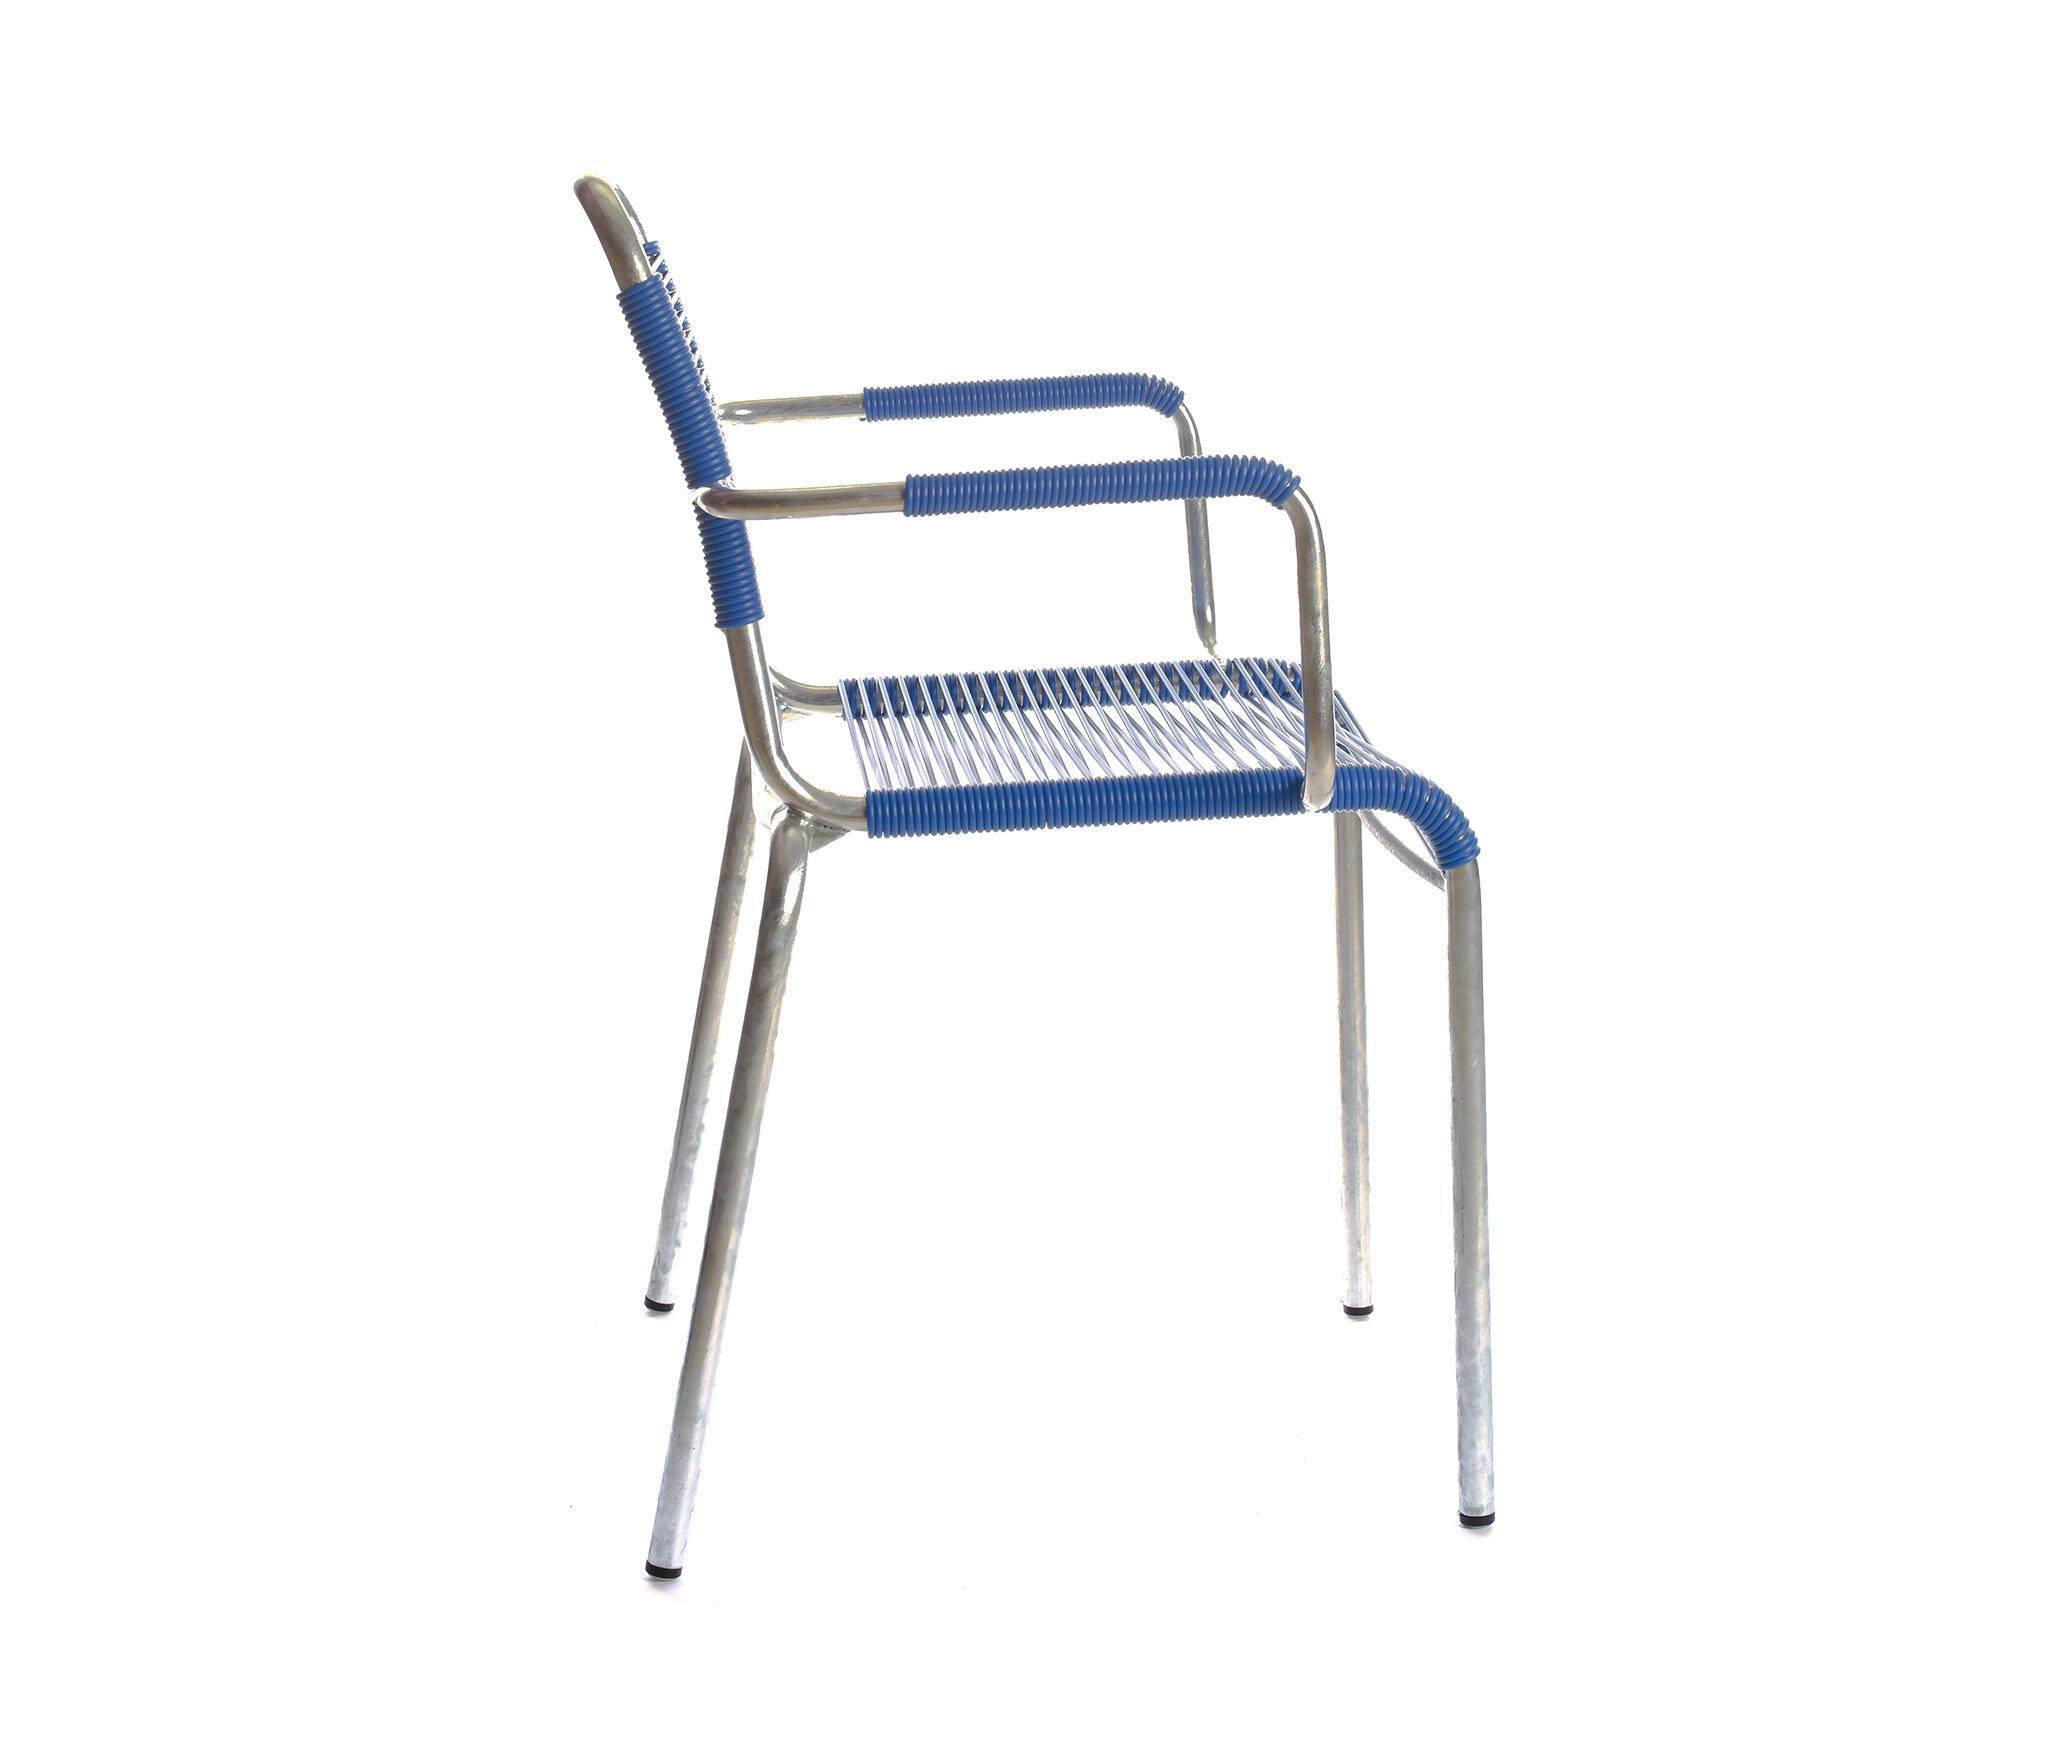 spaghetti stuhl 10a restaurant chairs from manufakt. Black Bedroom Furniture Sets. Home Design Ideas